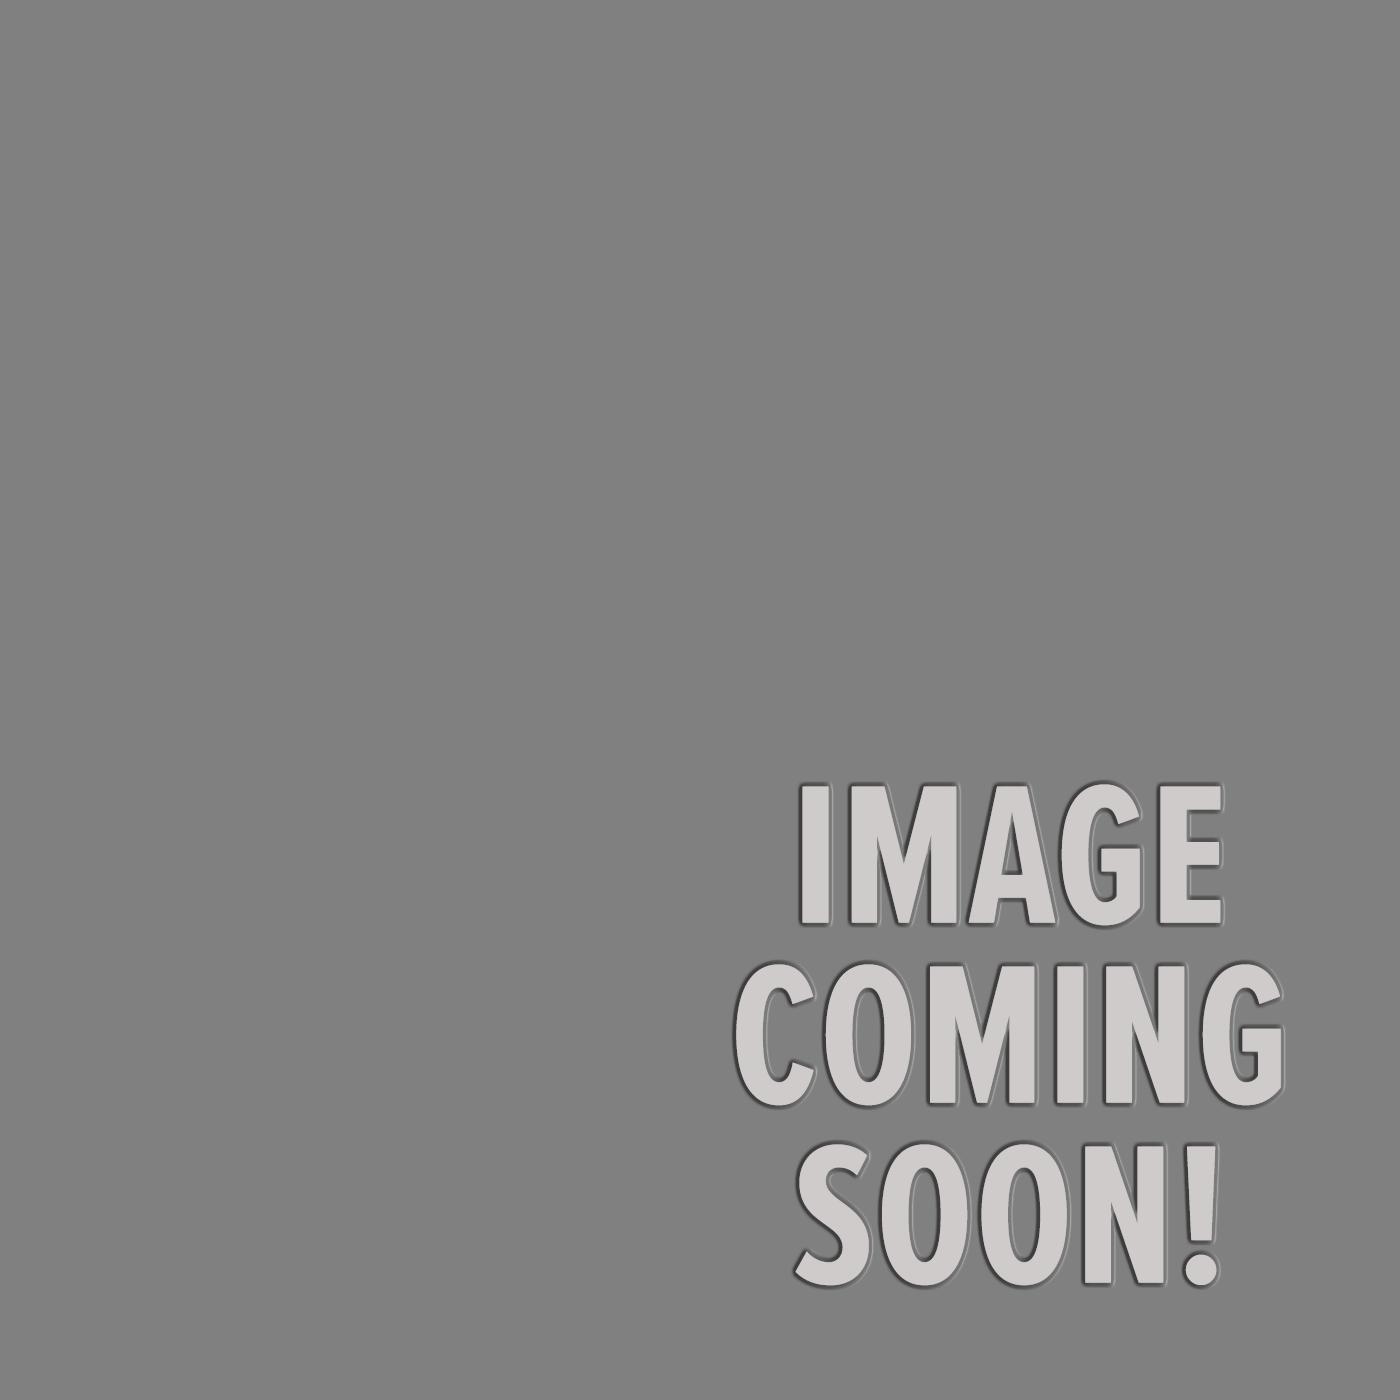 Image for 4003 Bass Guitar Matte Black from SamAsh